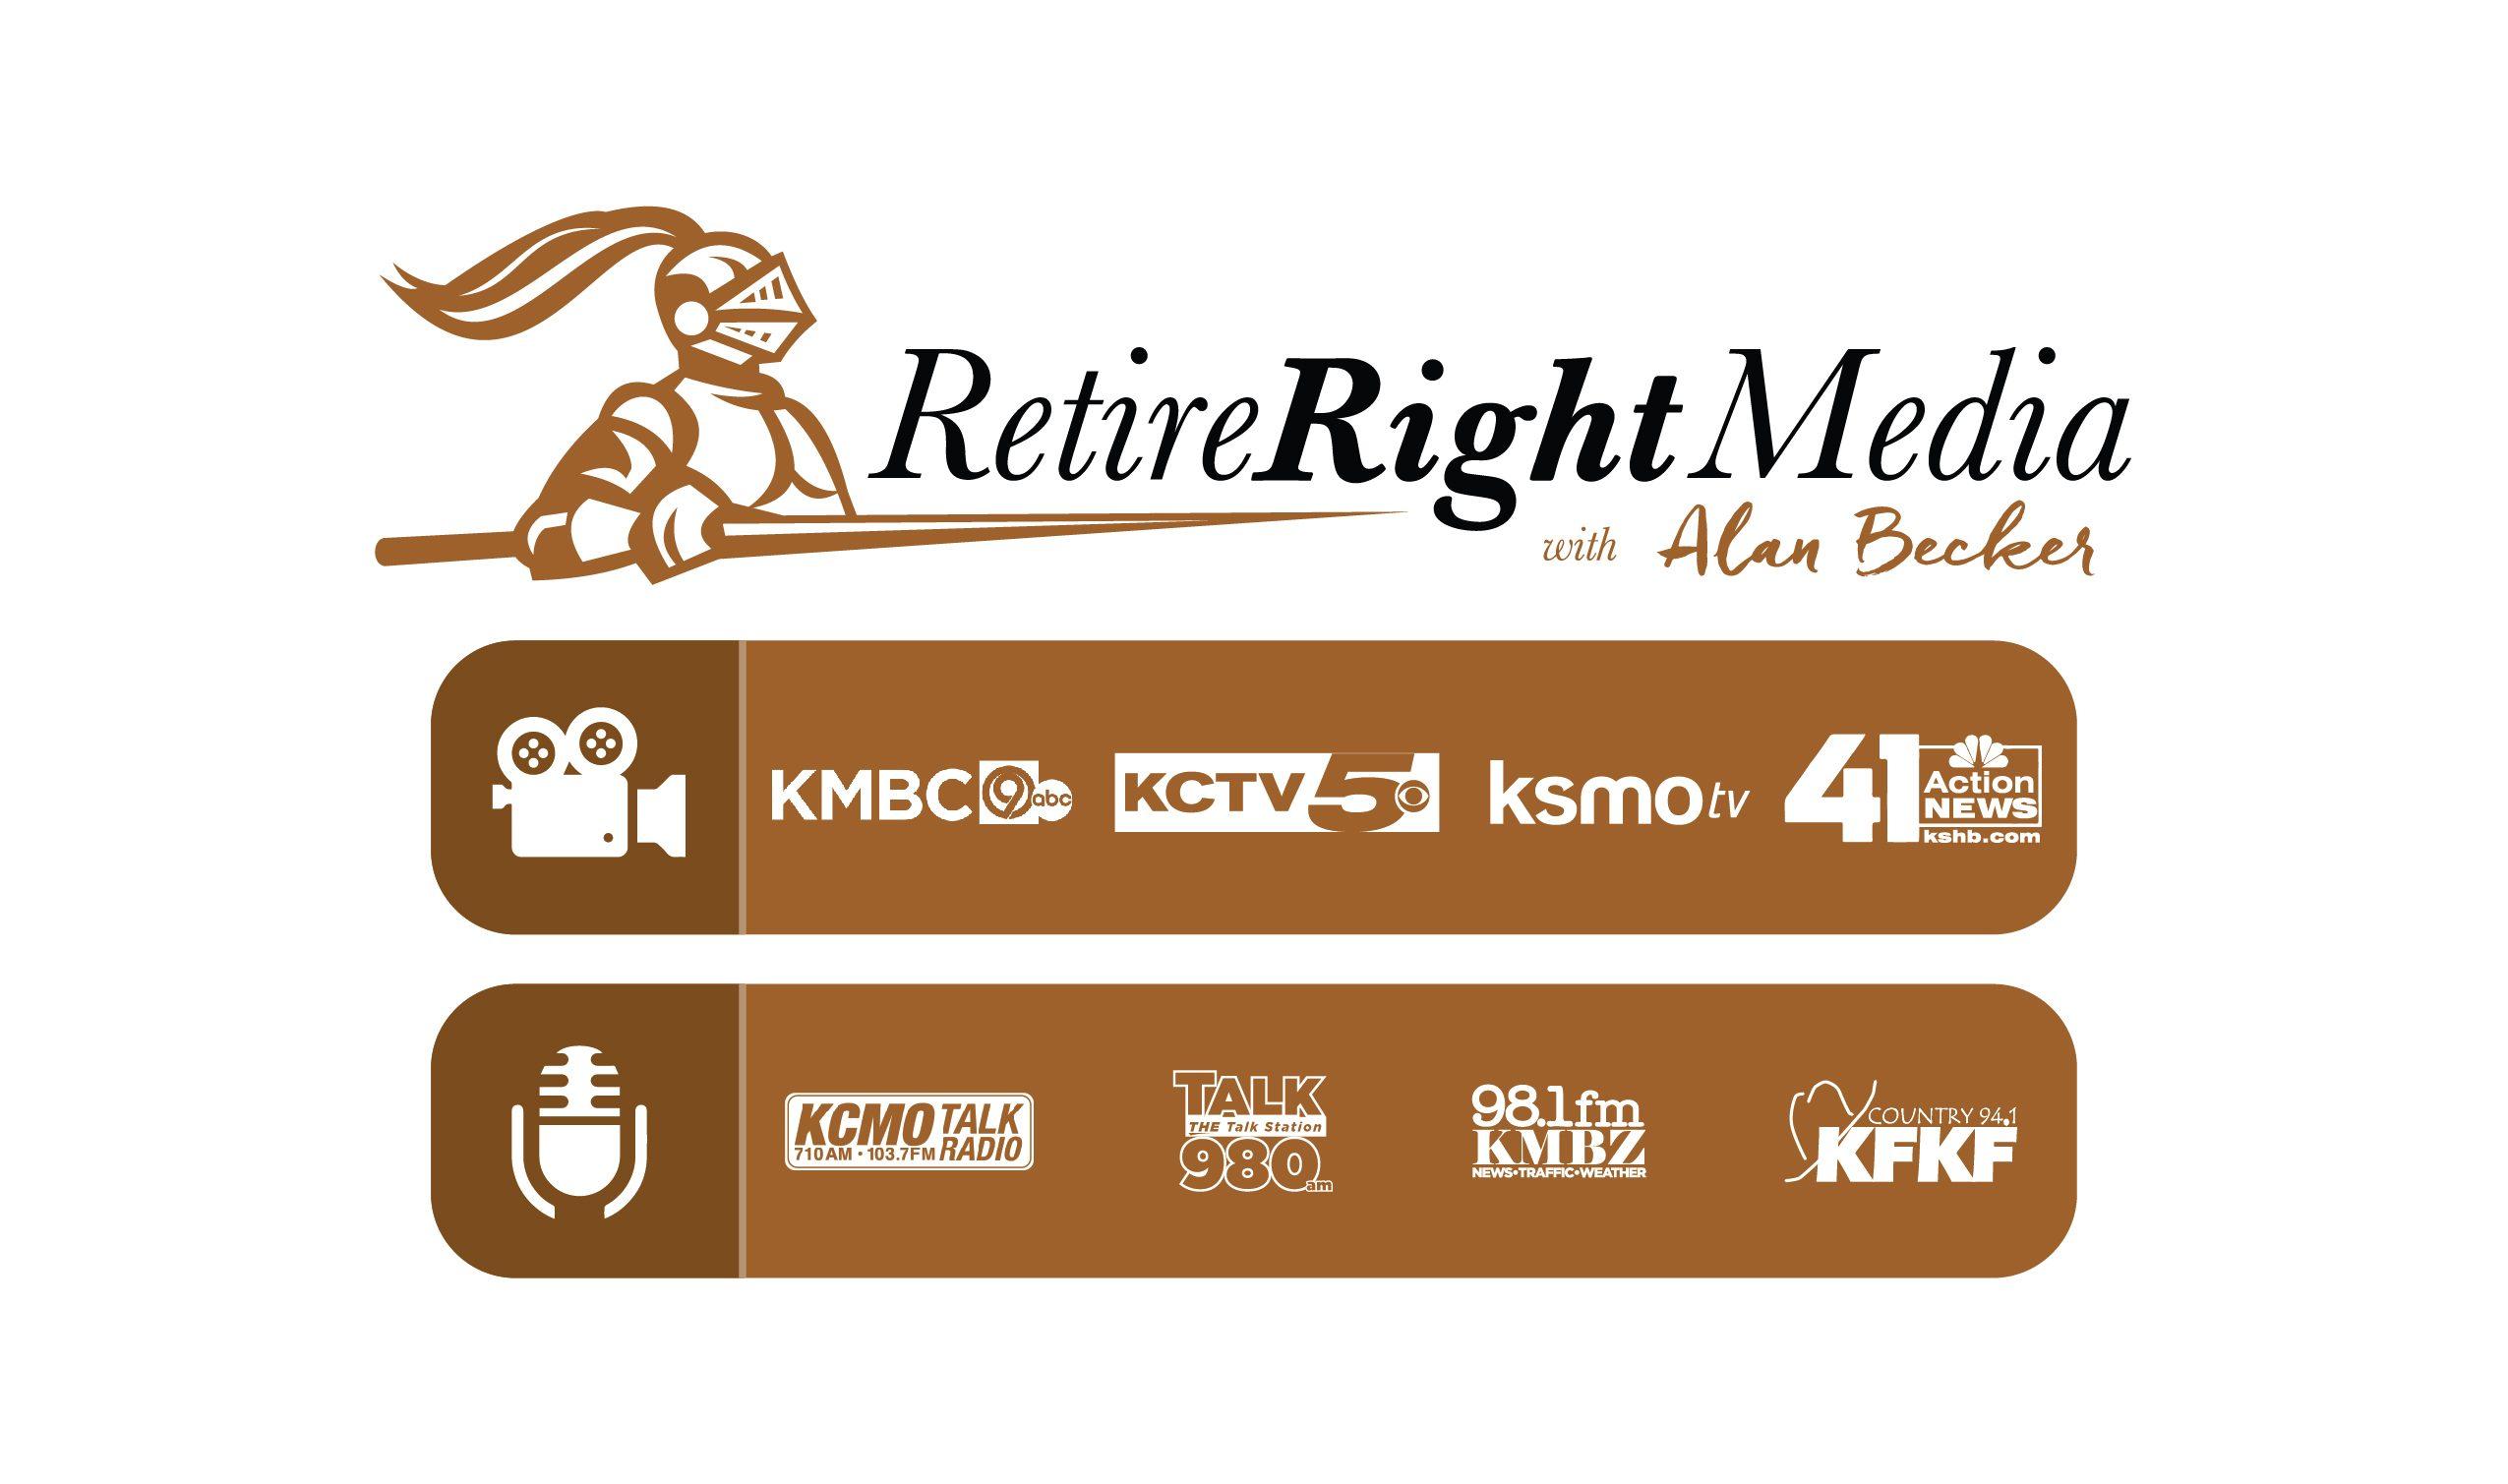 rsg_media_logo-01